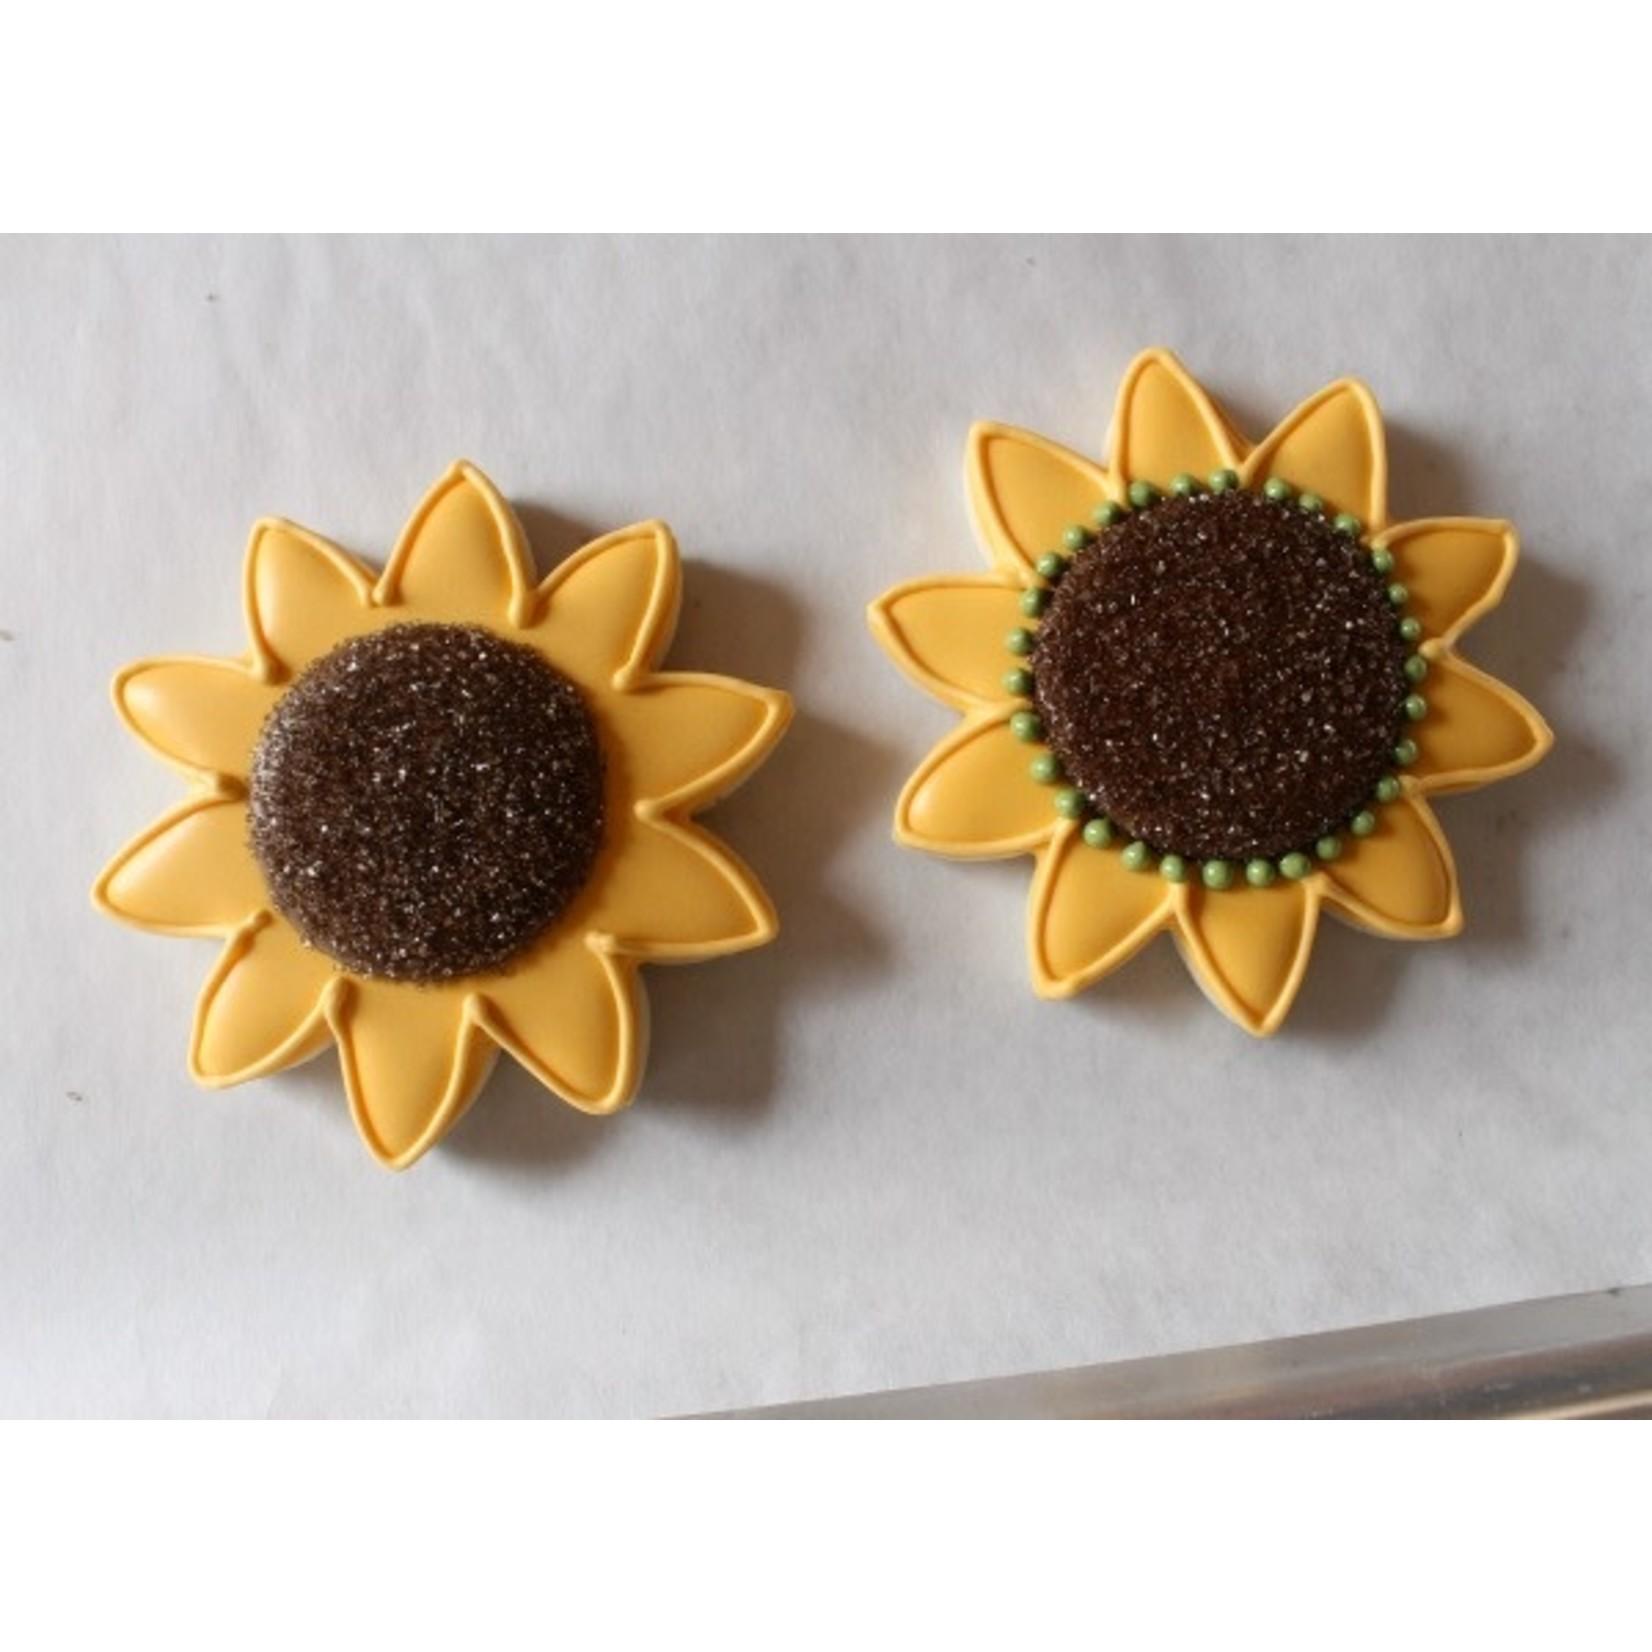 "3.5"" Sunflower Cookie Cutter"